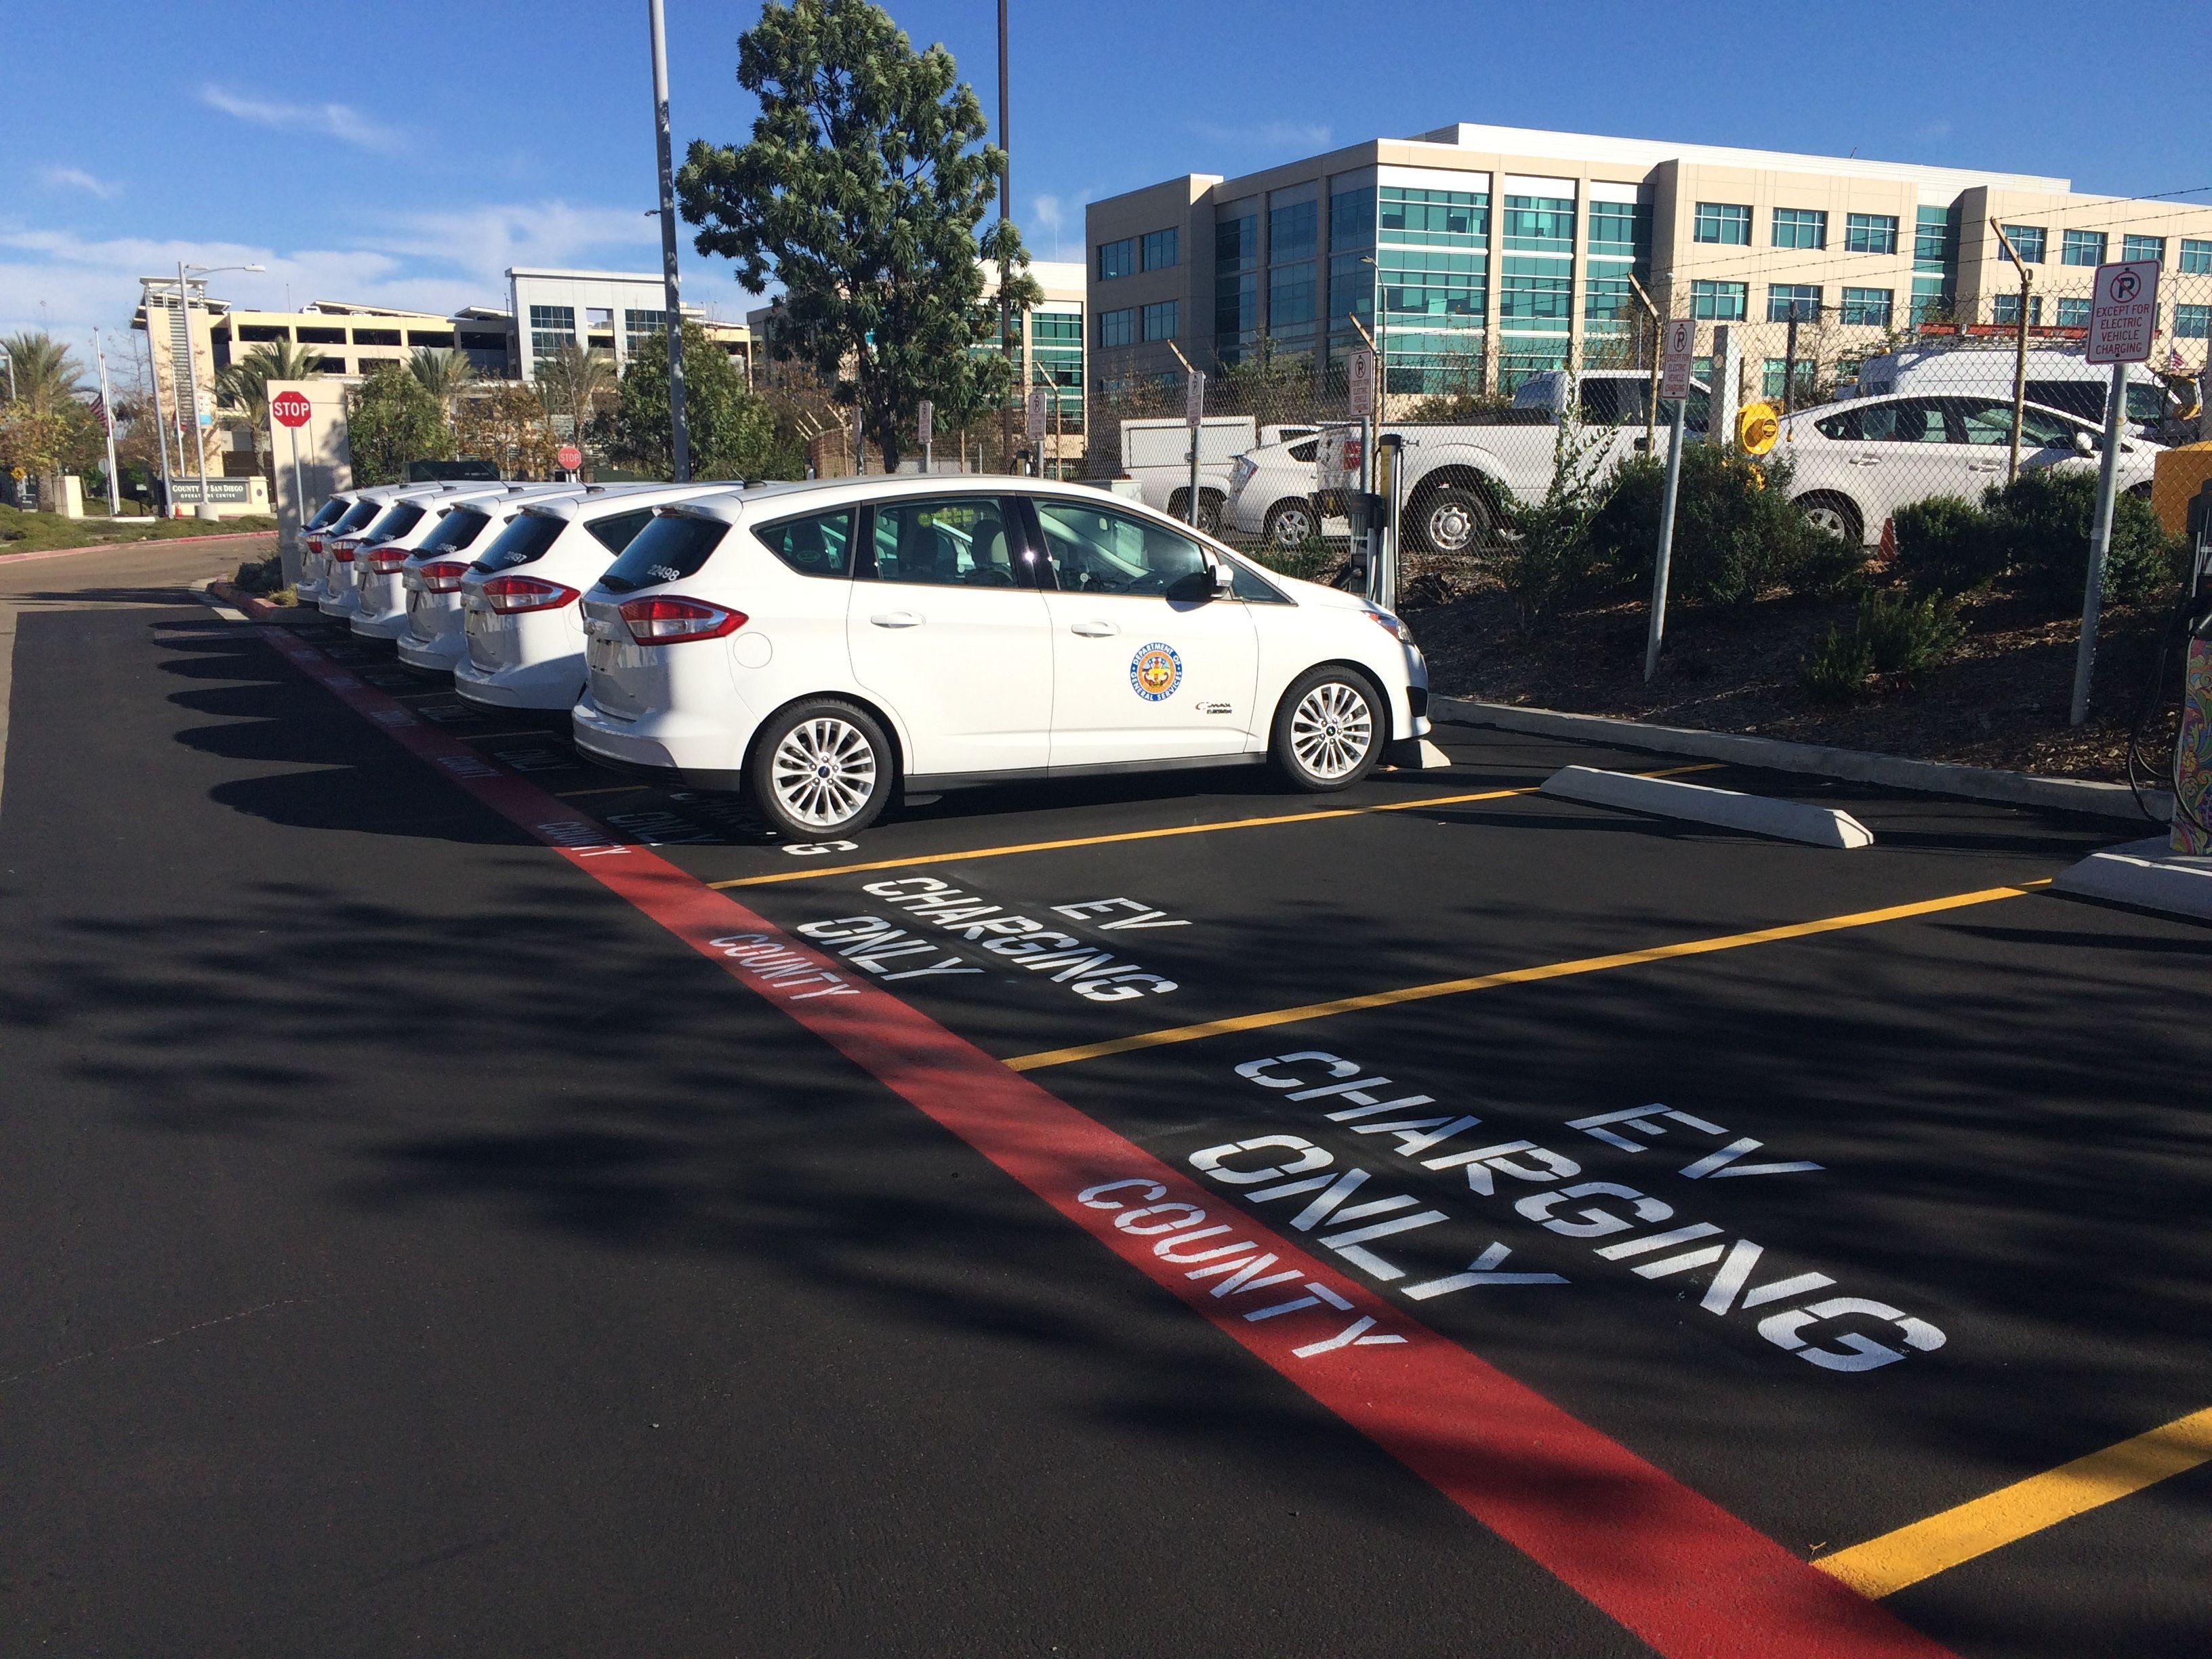 San Diego Opens EV Charging Sites, Plans 11 More